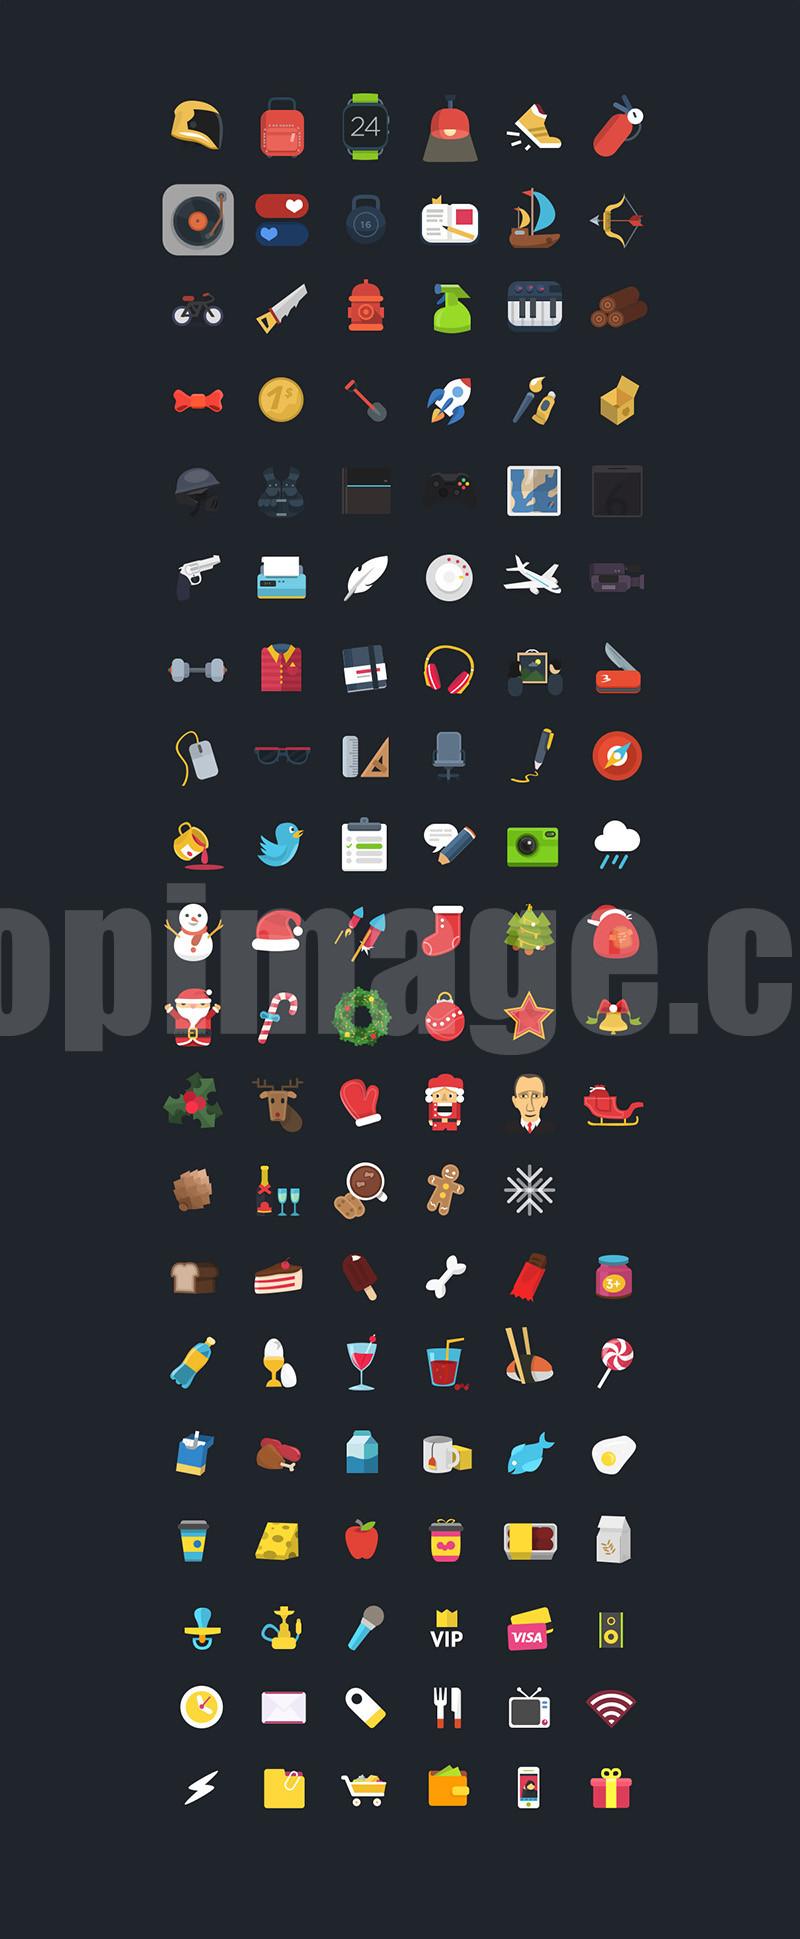 flat icon 图标 圣诞节 生活用品 工具 运动设备psd源文件下载